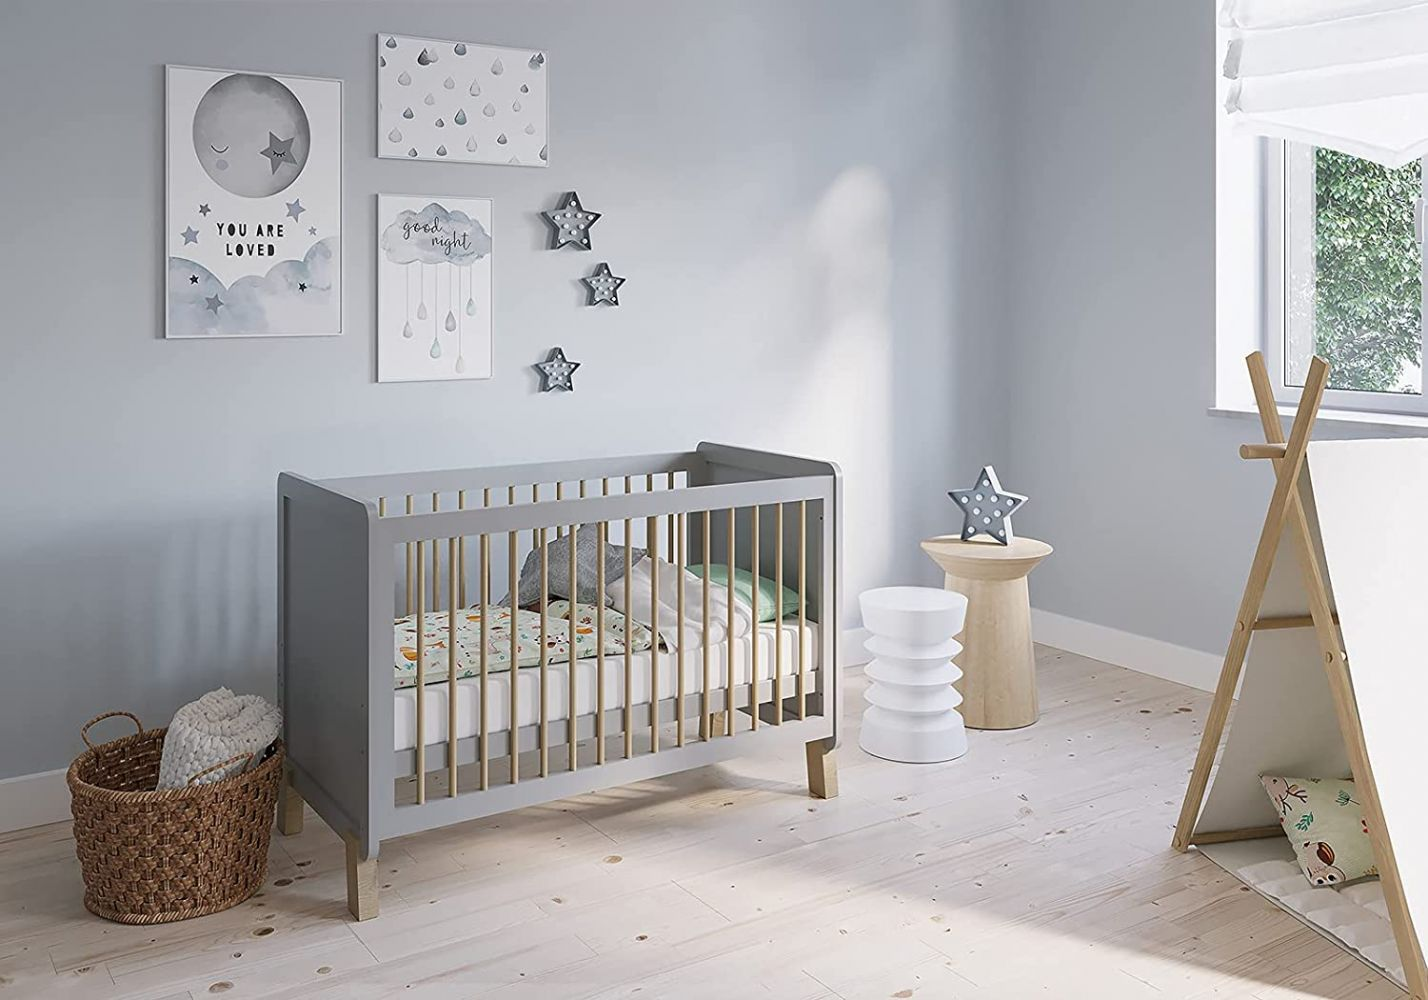 FabiMax 'Nachteule' Kinderbett, 60 x 120 cm, grau/natur, Kiefer massiv, 3-fach höhenverstellbar, umbaubar Bild 1